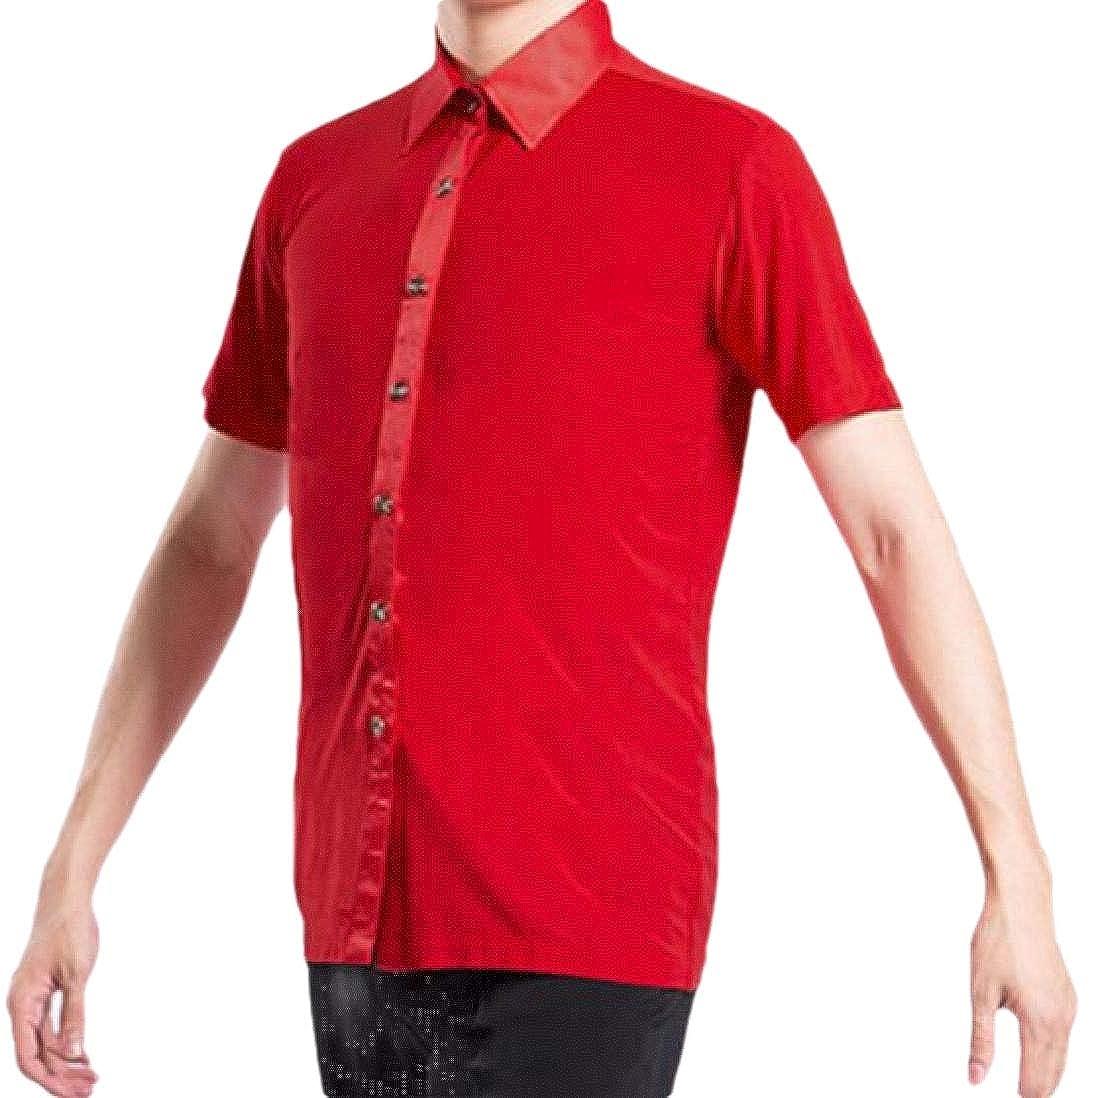 pujingge Mens Slim Fit Dress Shirt Long Sleeve Dance Party Shirt